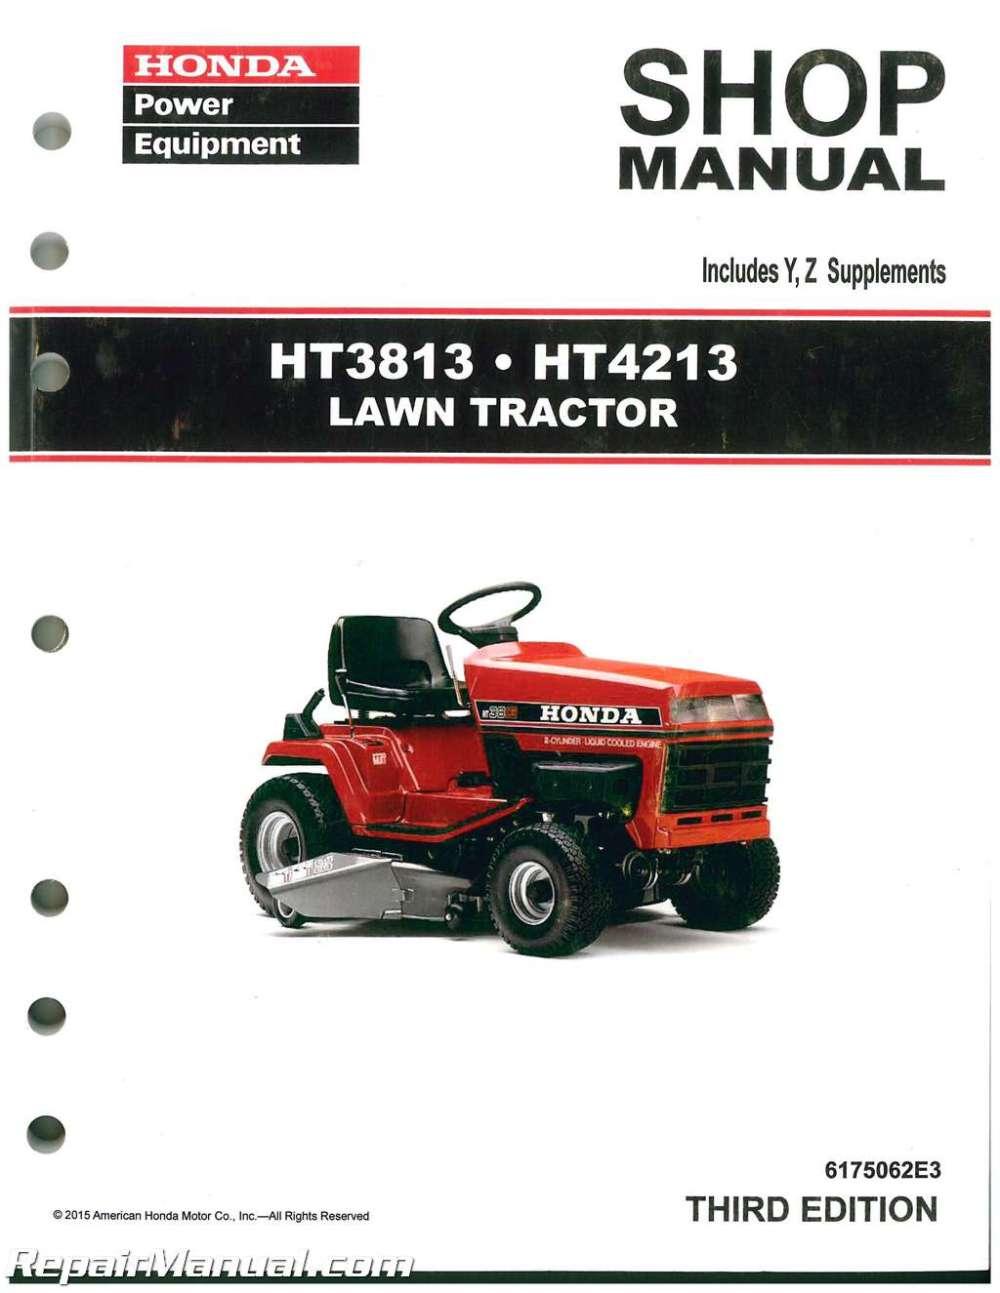 medium resolution of wire diagram honda 3813 wiring diagrams honda yard tractors honda ht3813 ht4213 lawn tractor shop manual